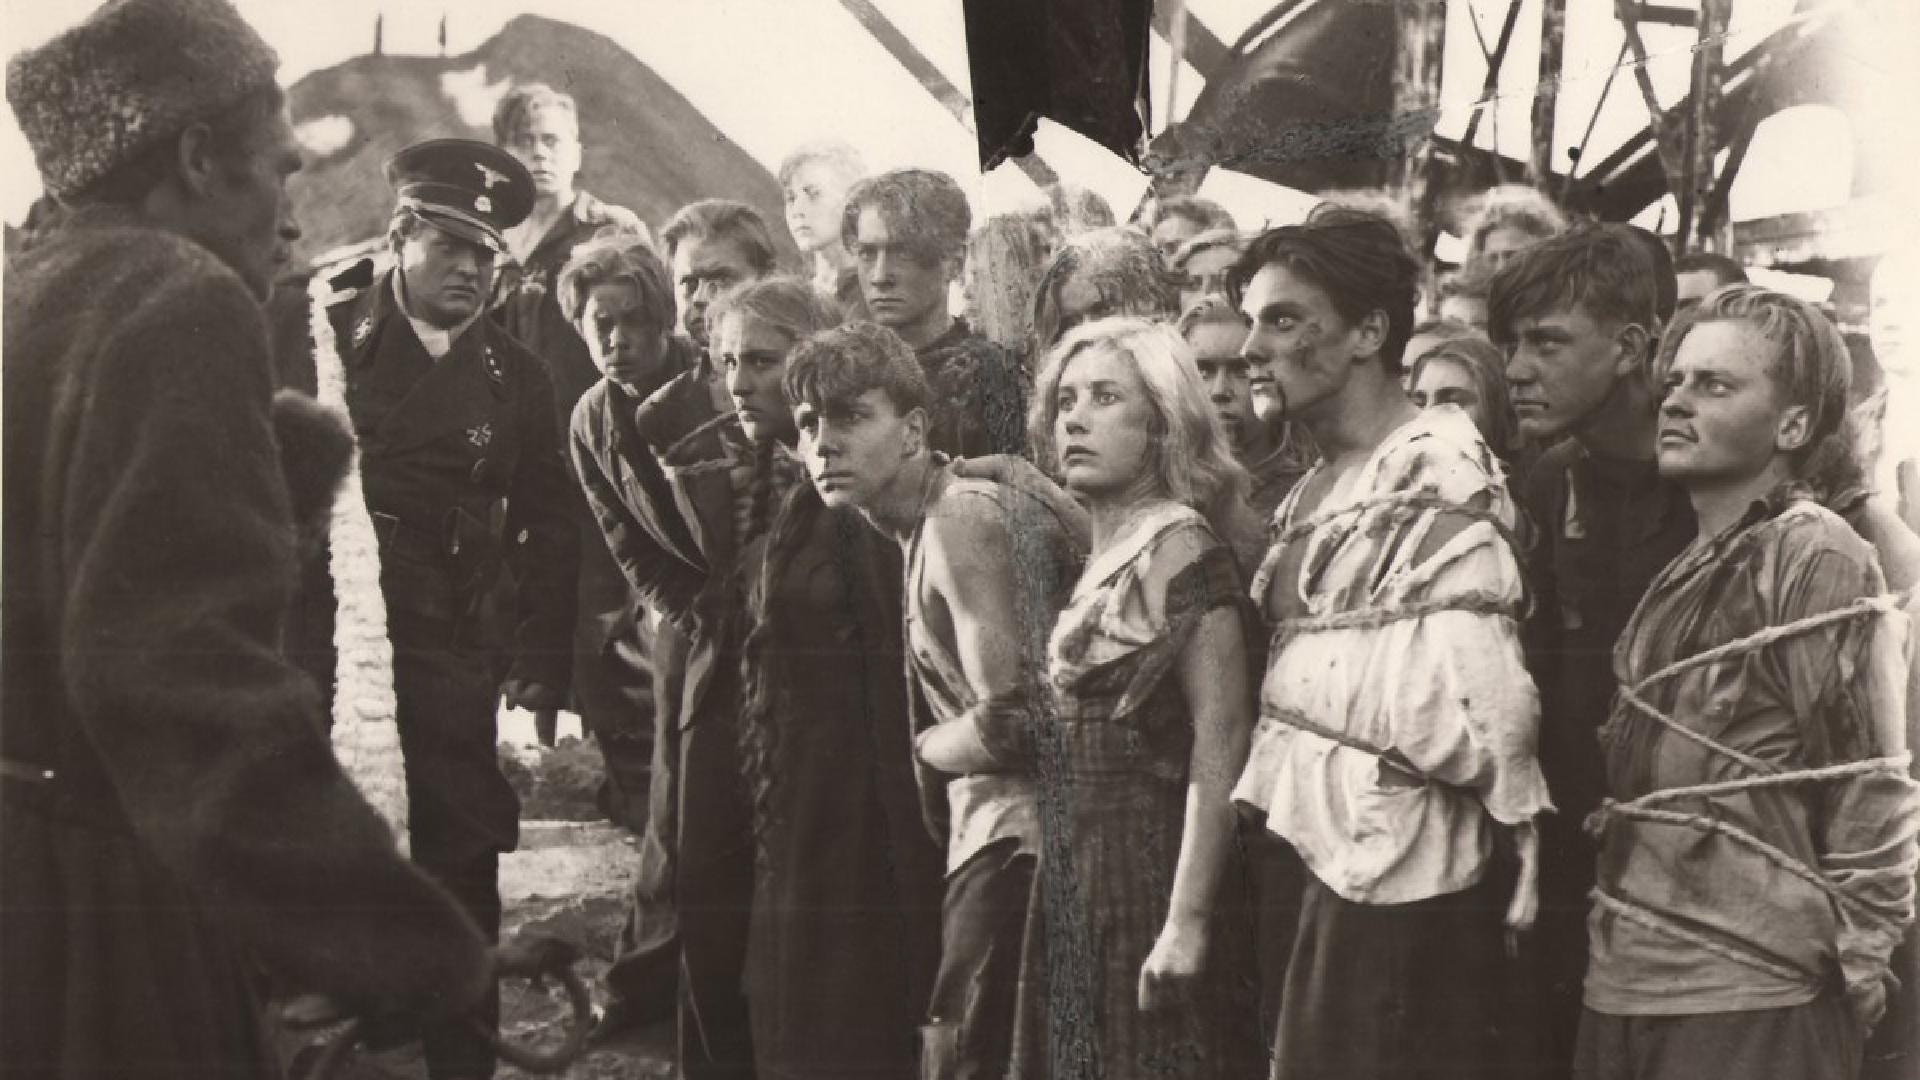 Мокрая Елена Коренева – Романс О Влюбленных (1974)